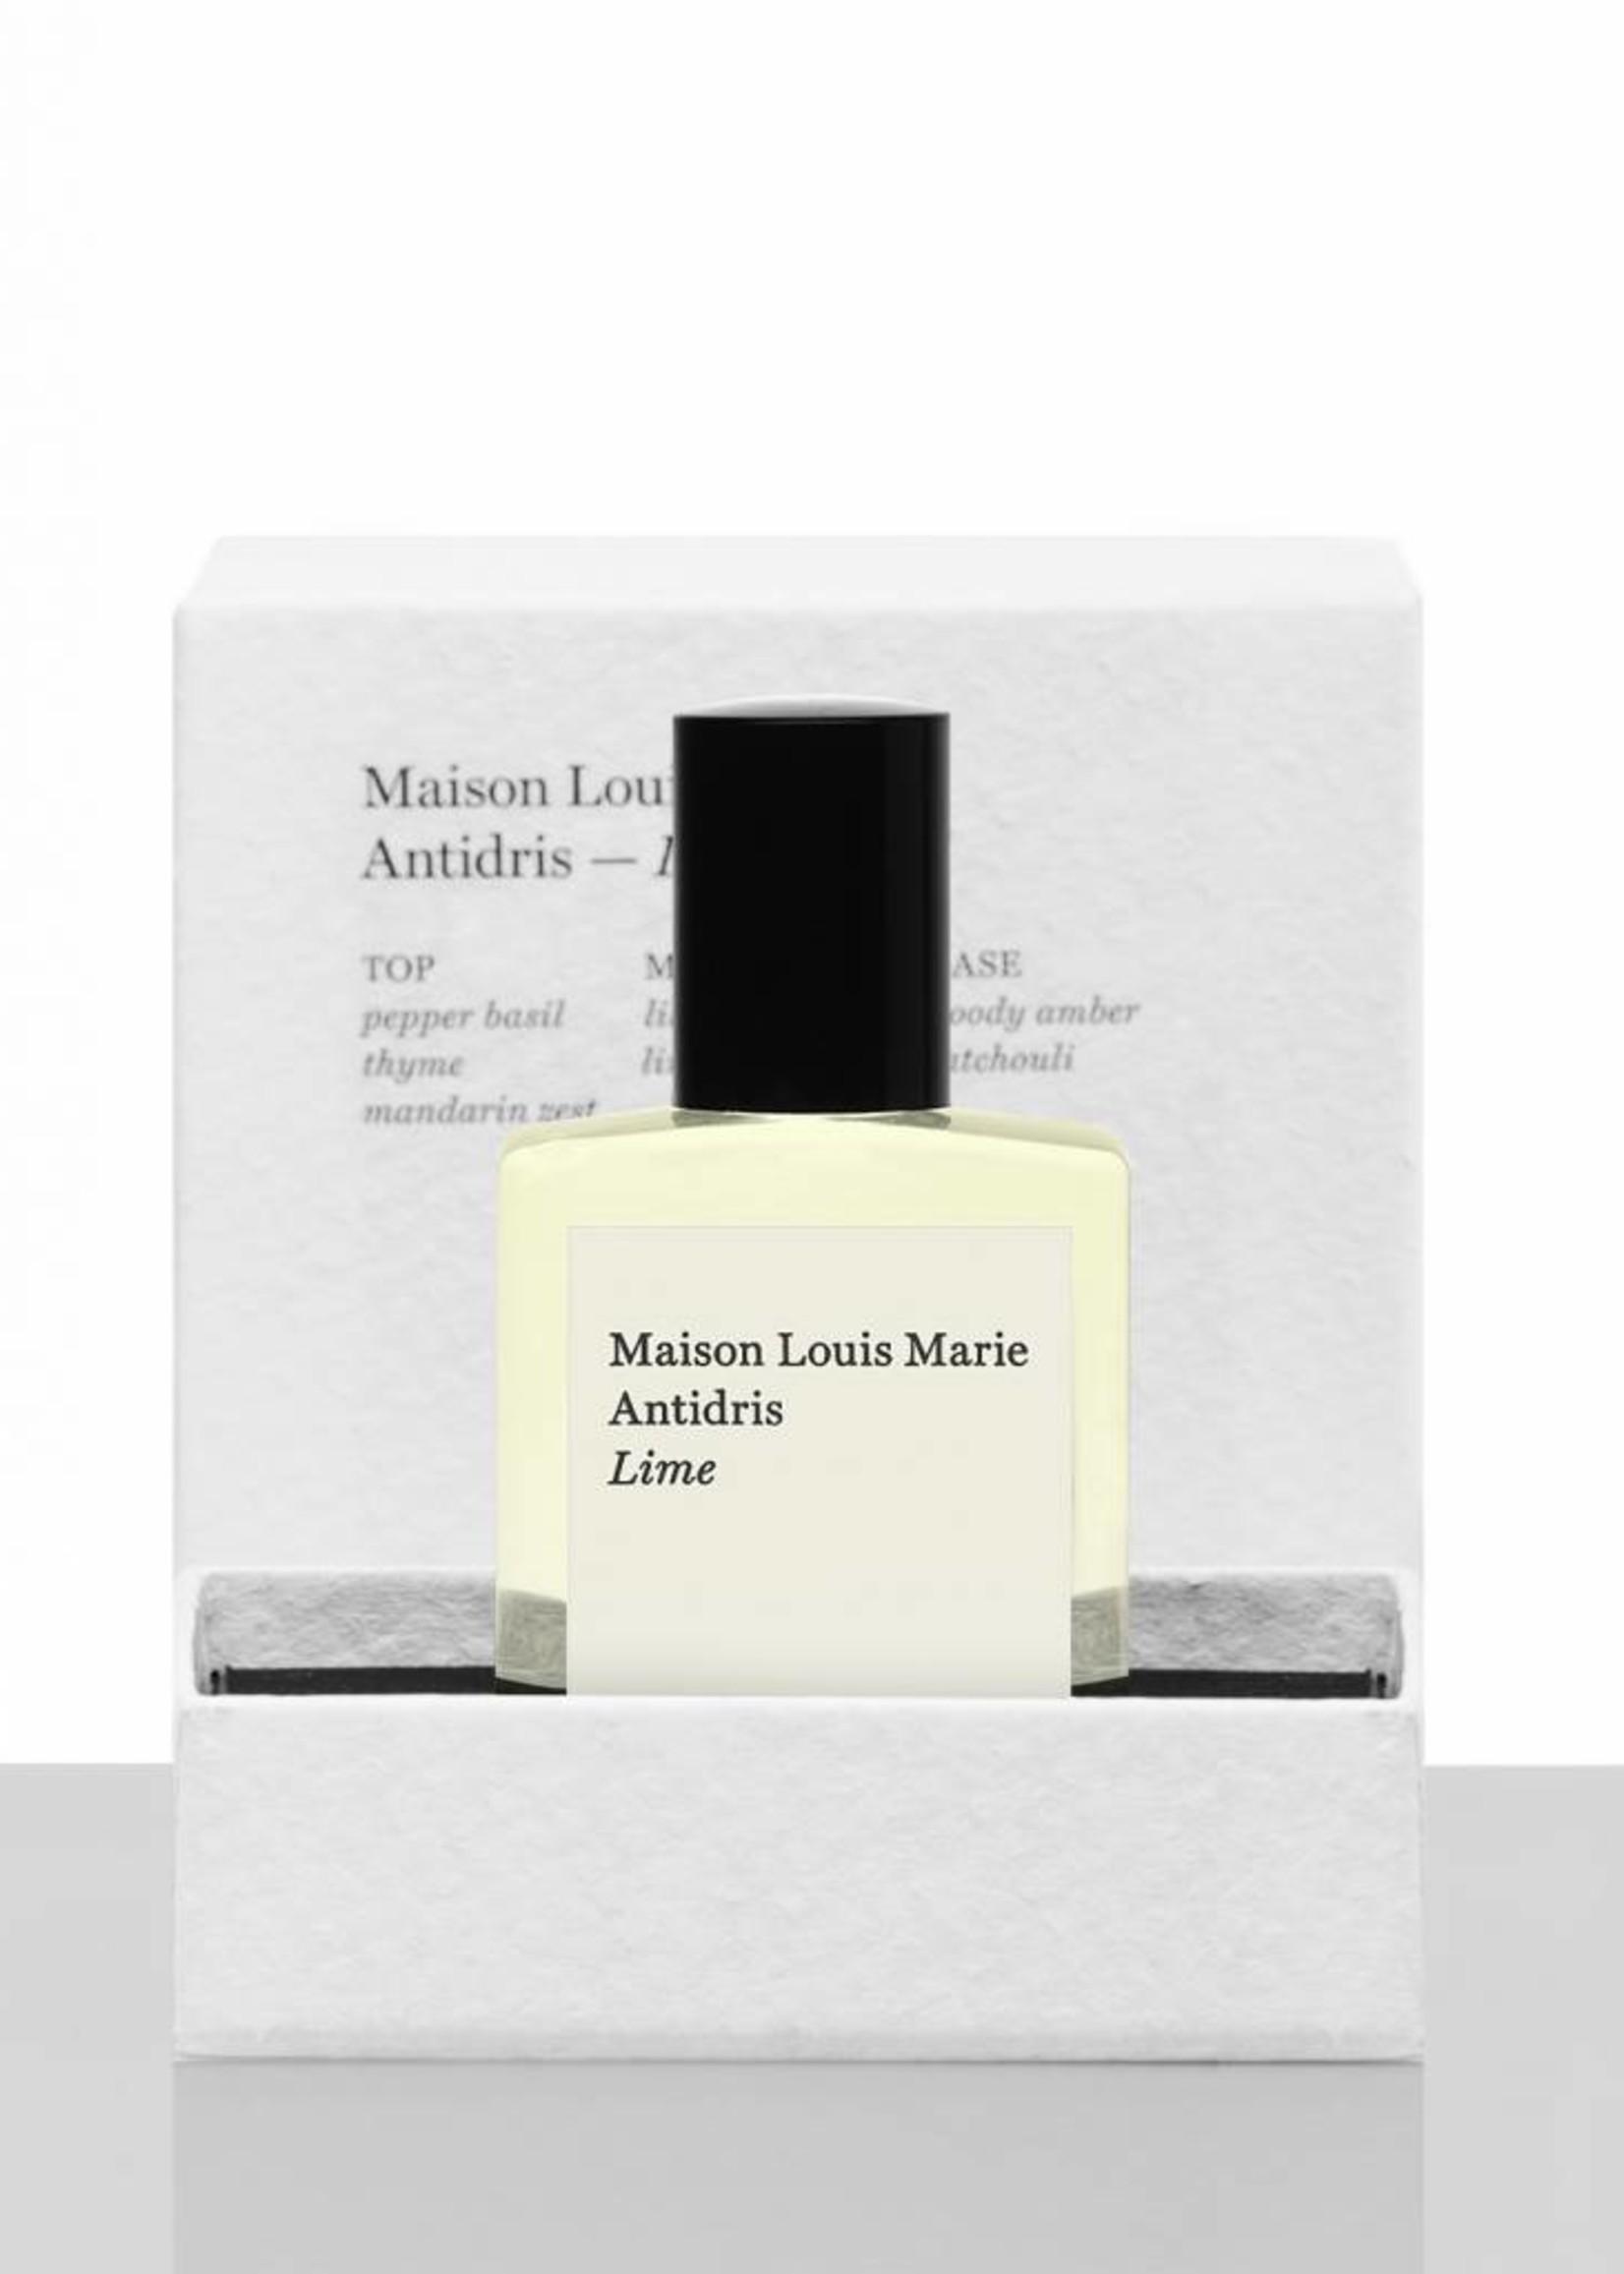 Maison Louis Marie maison louis marie antidris lime perfume oil